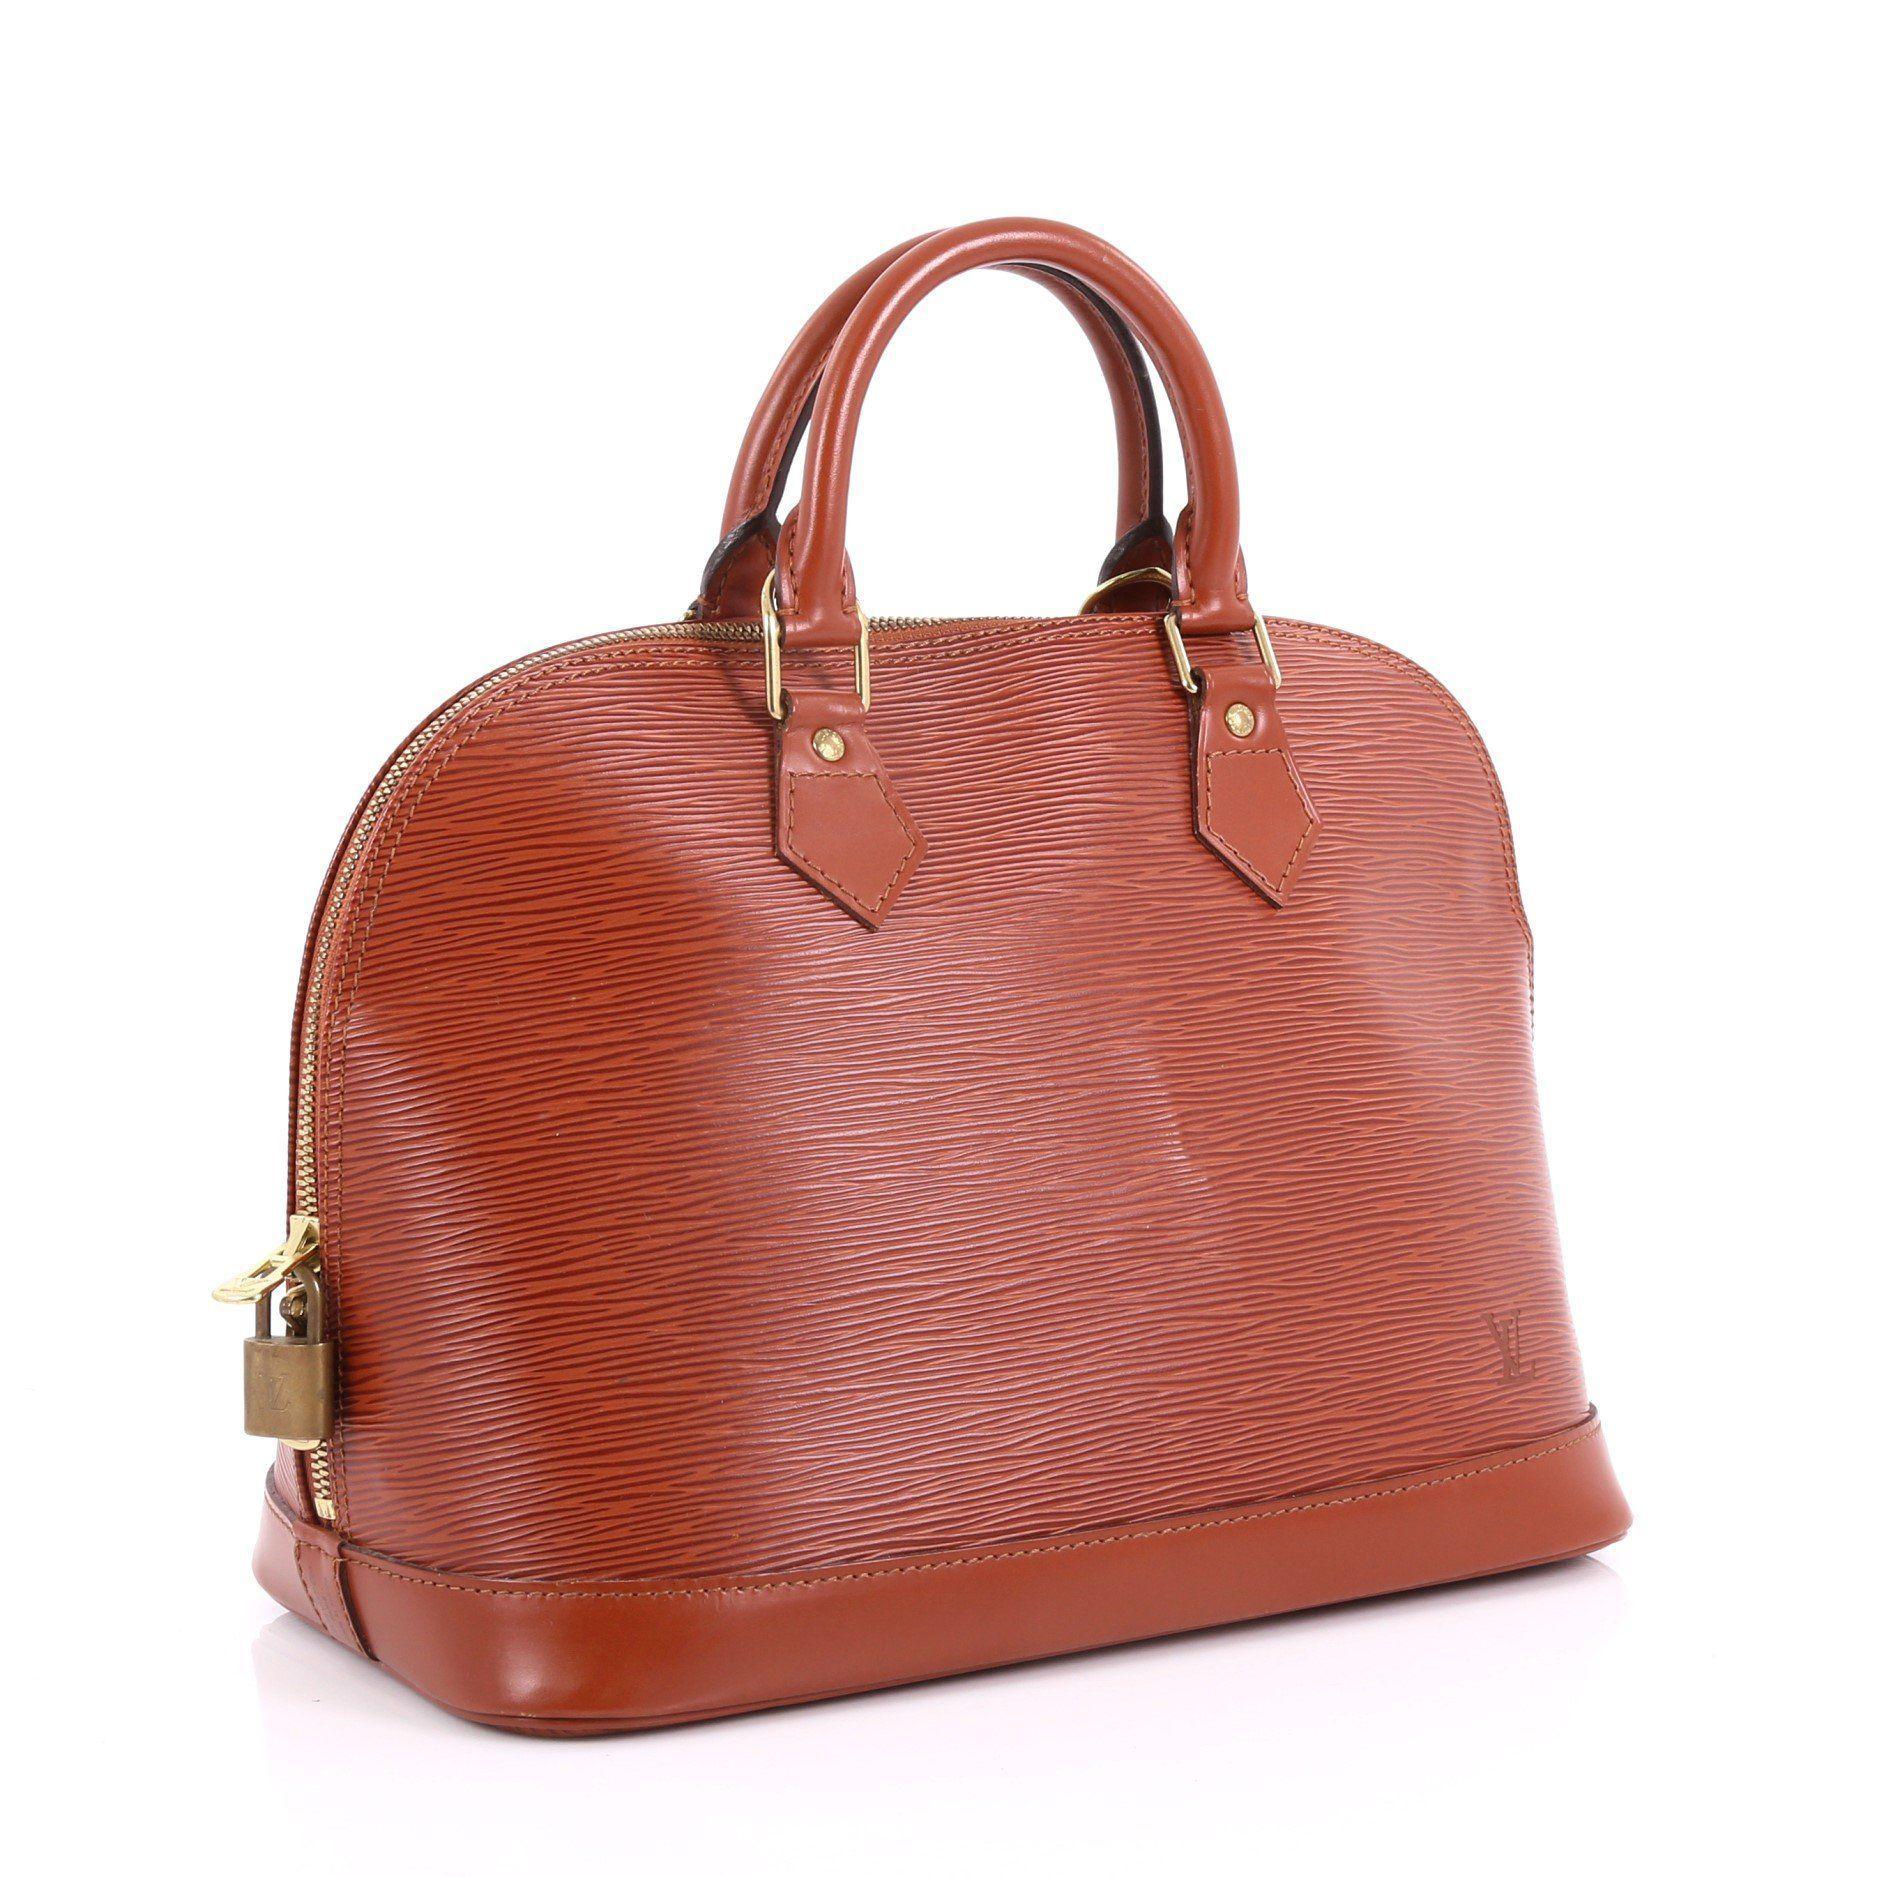 0f8ae14e5002 Louis Vuitton - Red Pre Owned Vintage Alma Handbag Epi Leather Pm - Lyst.  View fullscreen